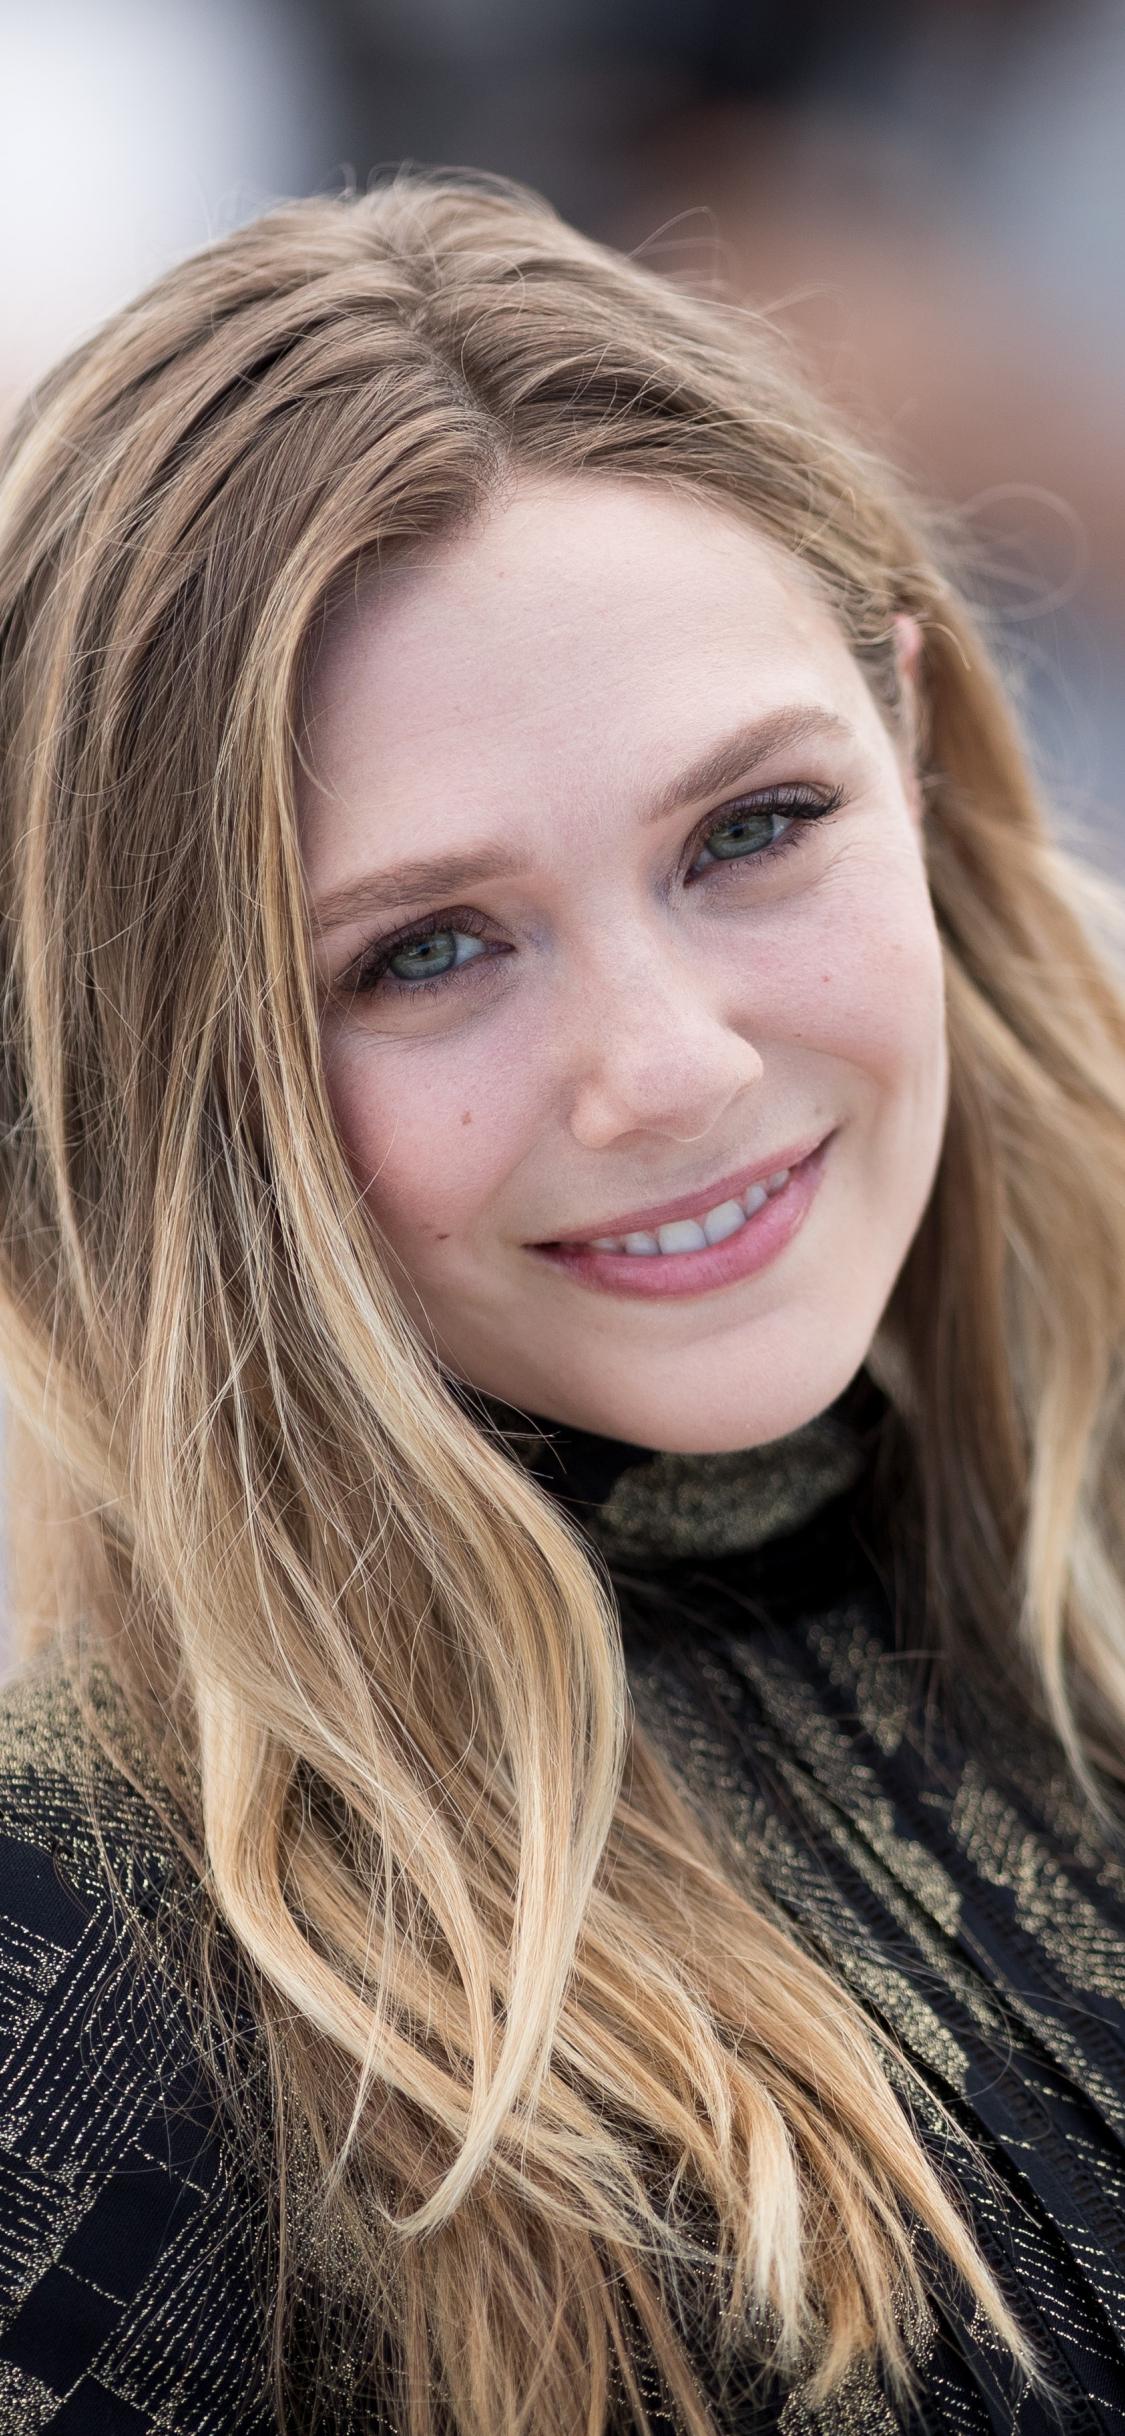 Smile, actress, at premier, Elizabeth Olsen, 1125x2436 wallpaper